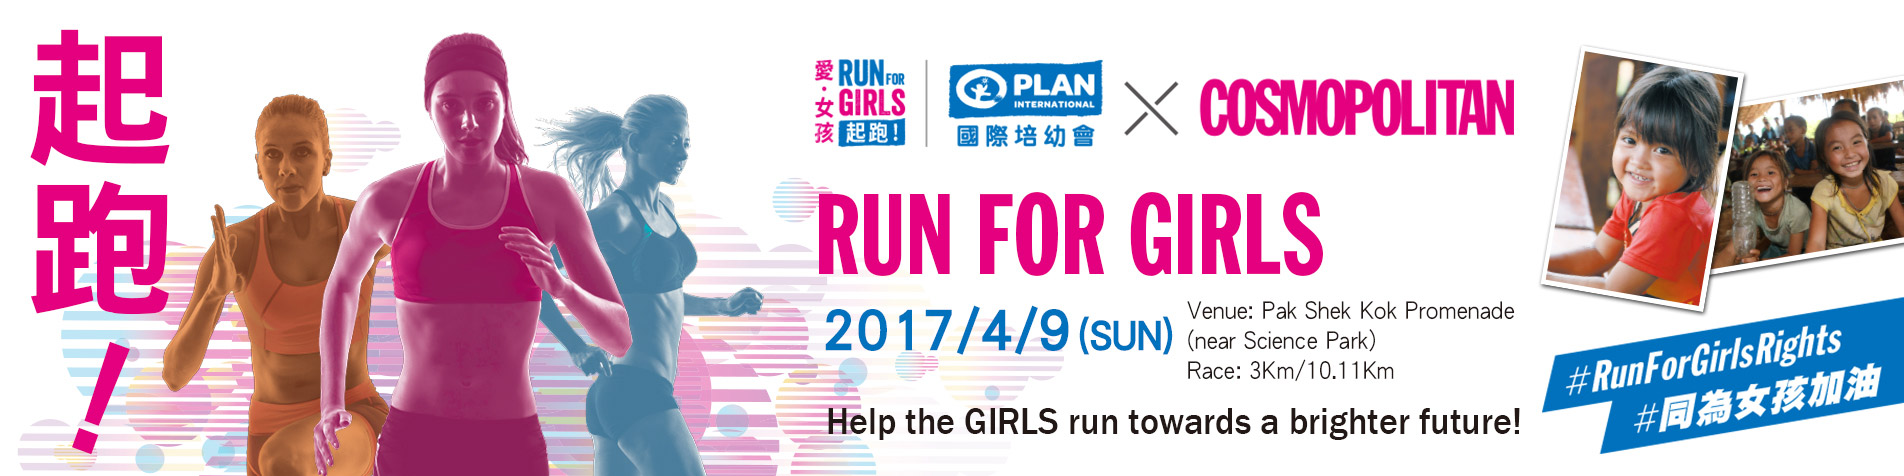 Run For Girls 2017